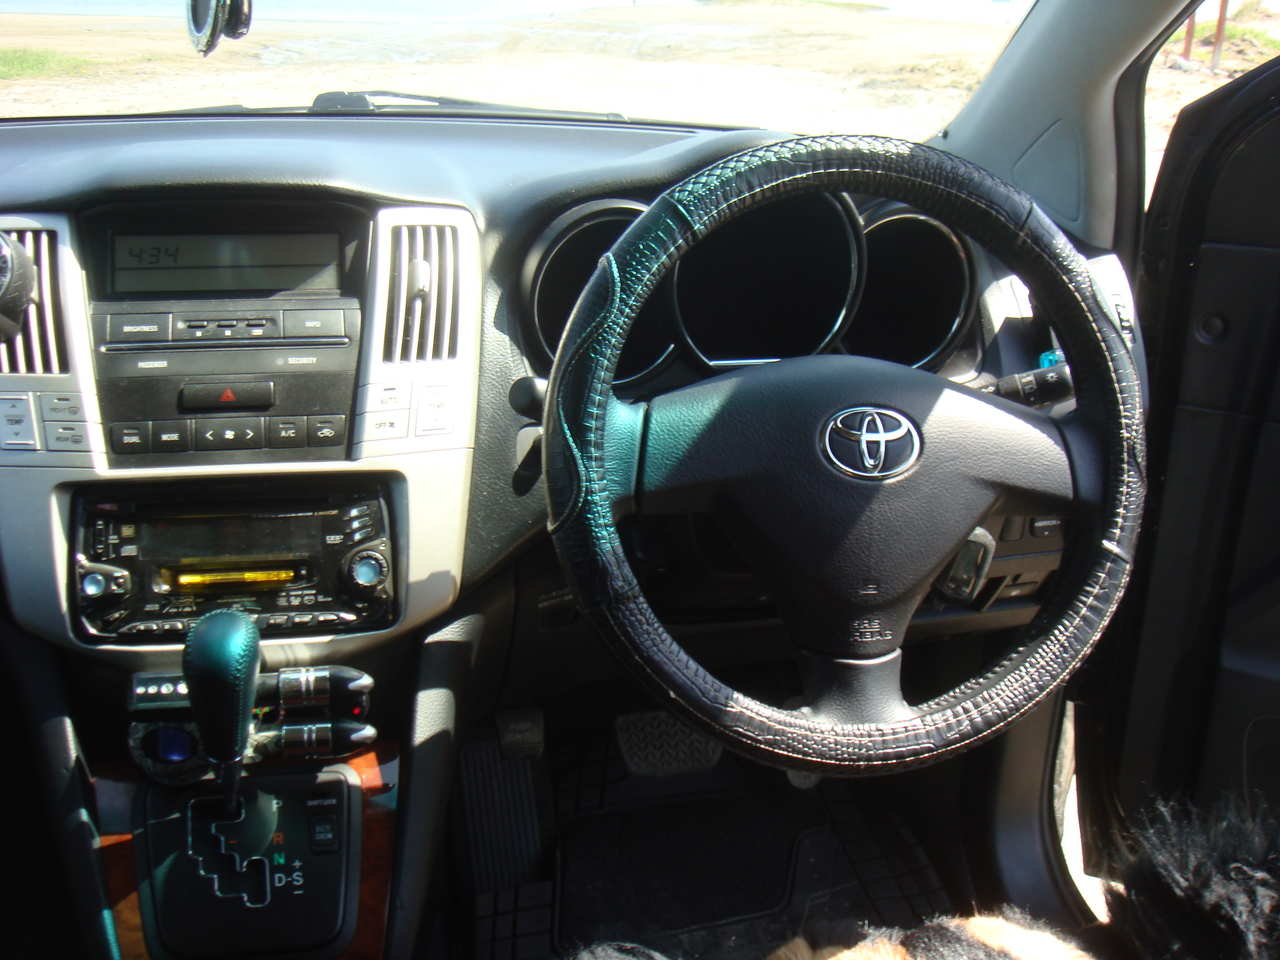 used 2008 toyota harrier photos 2400cc gasoline ff cvt for sale rh cars directory net Toyota Harrier Diesel Toyota Gli Car